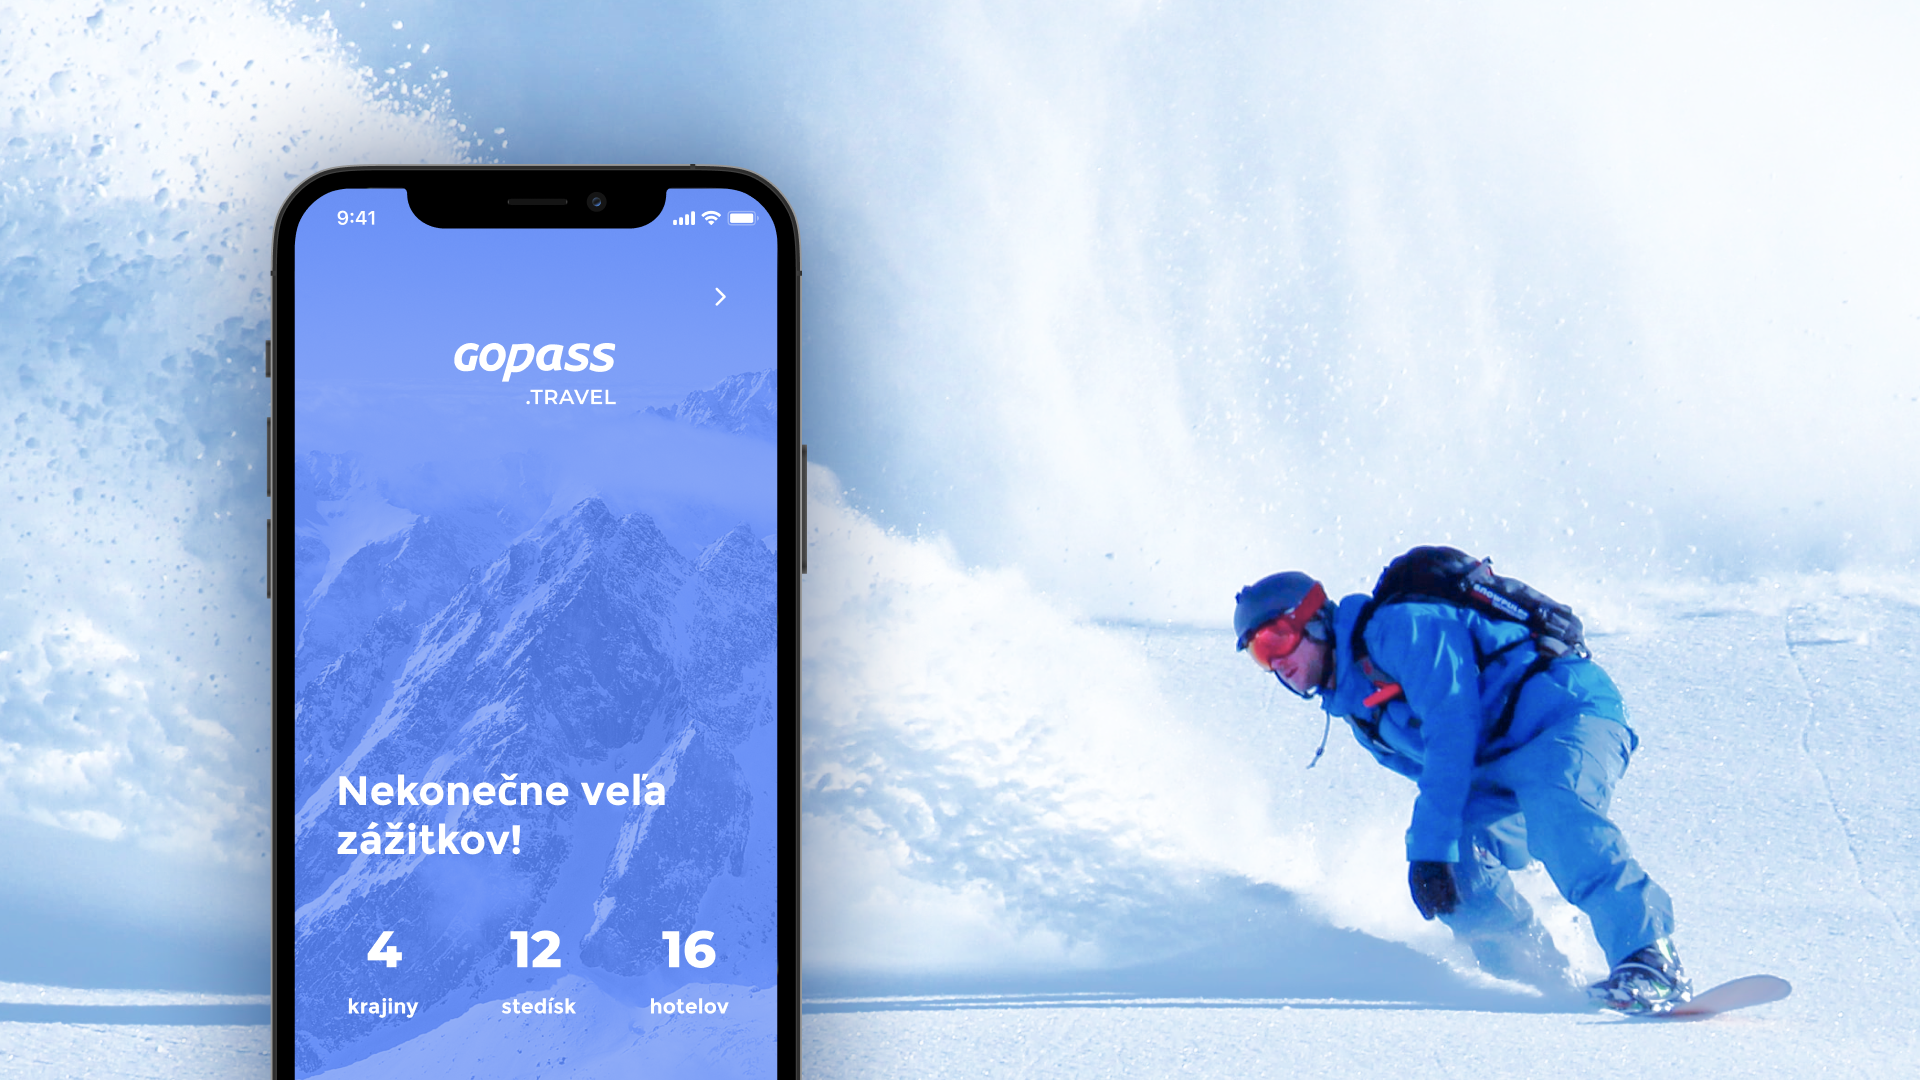 gopass mobile application